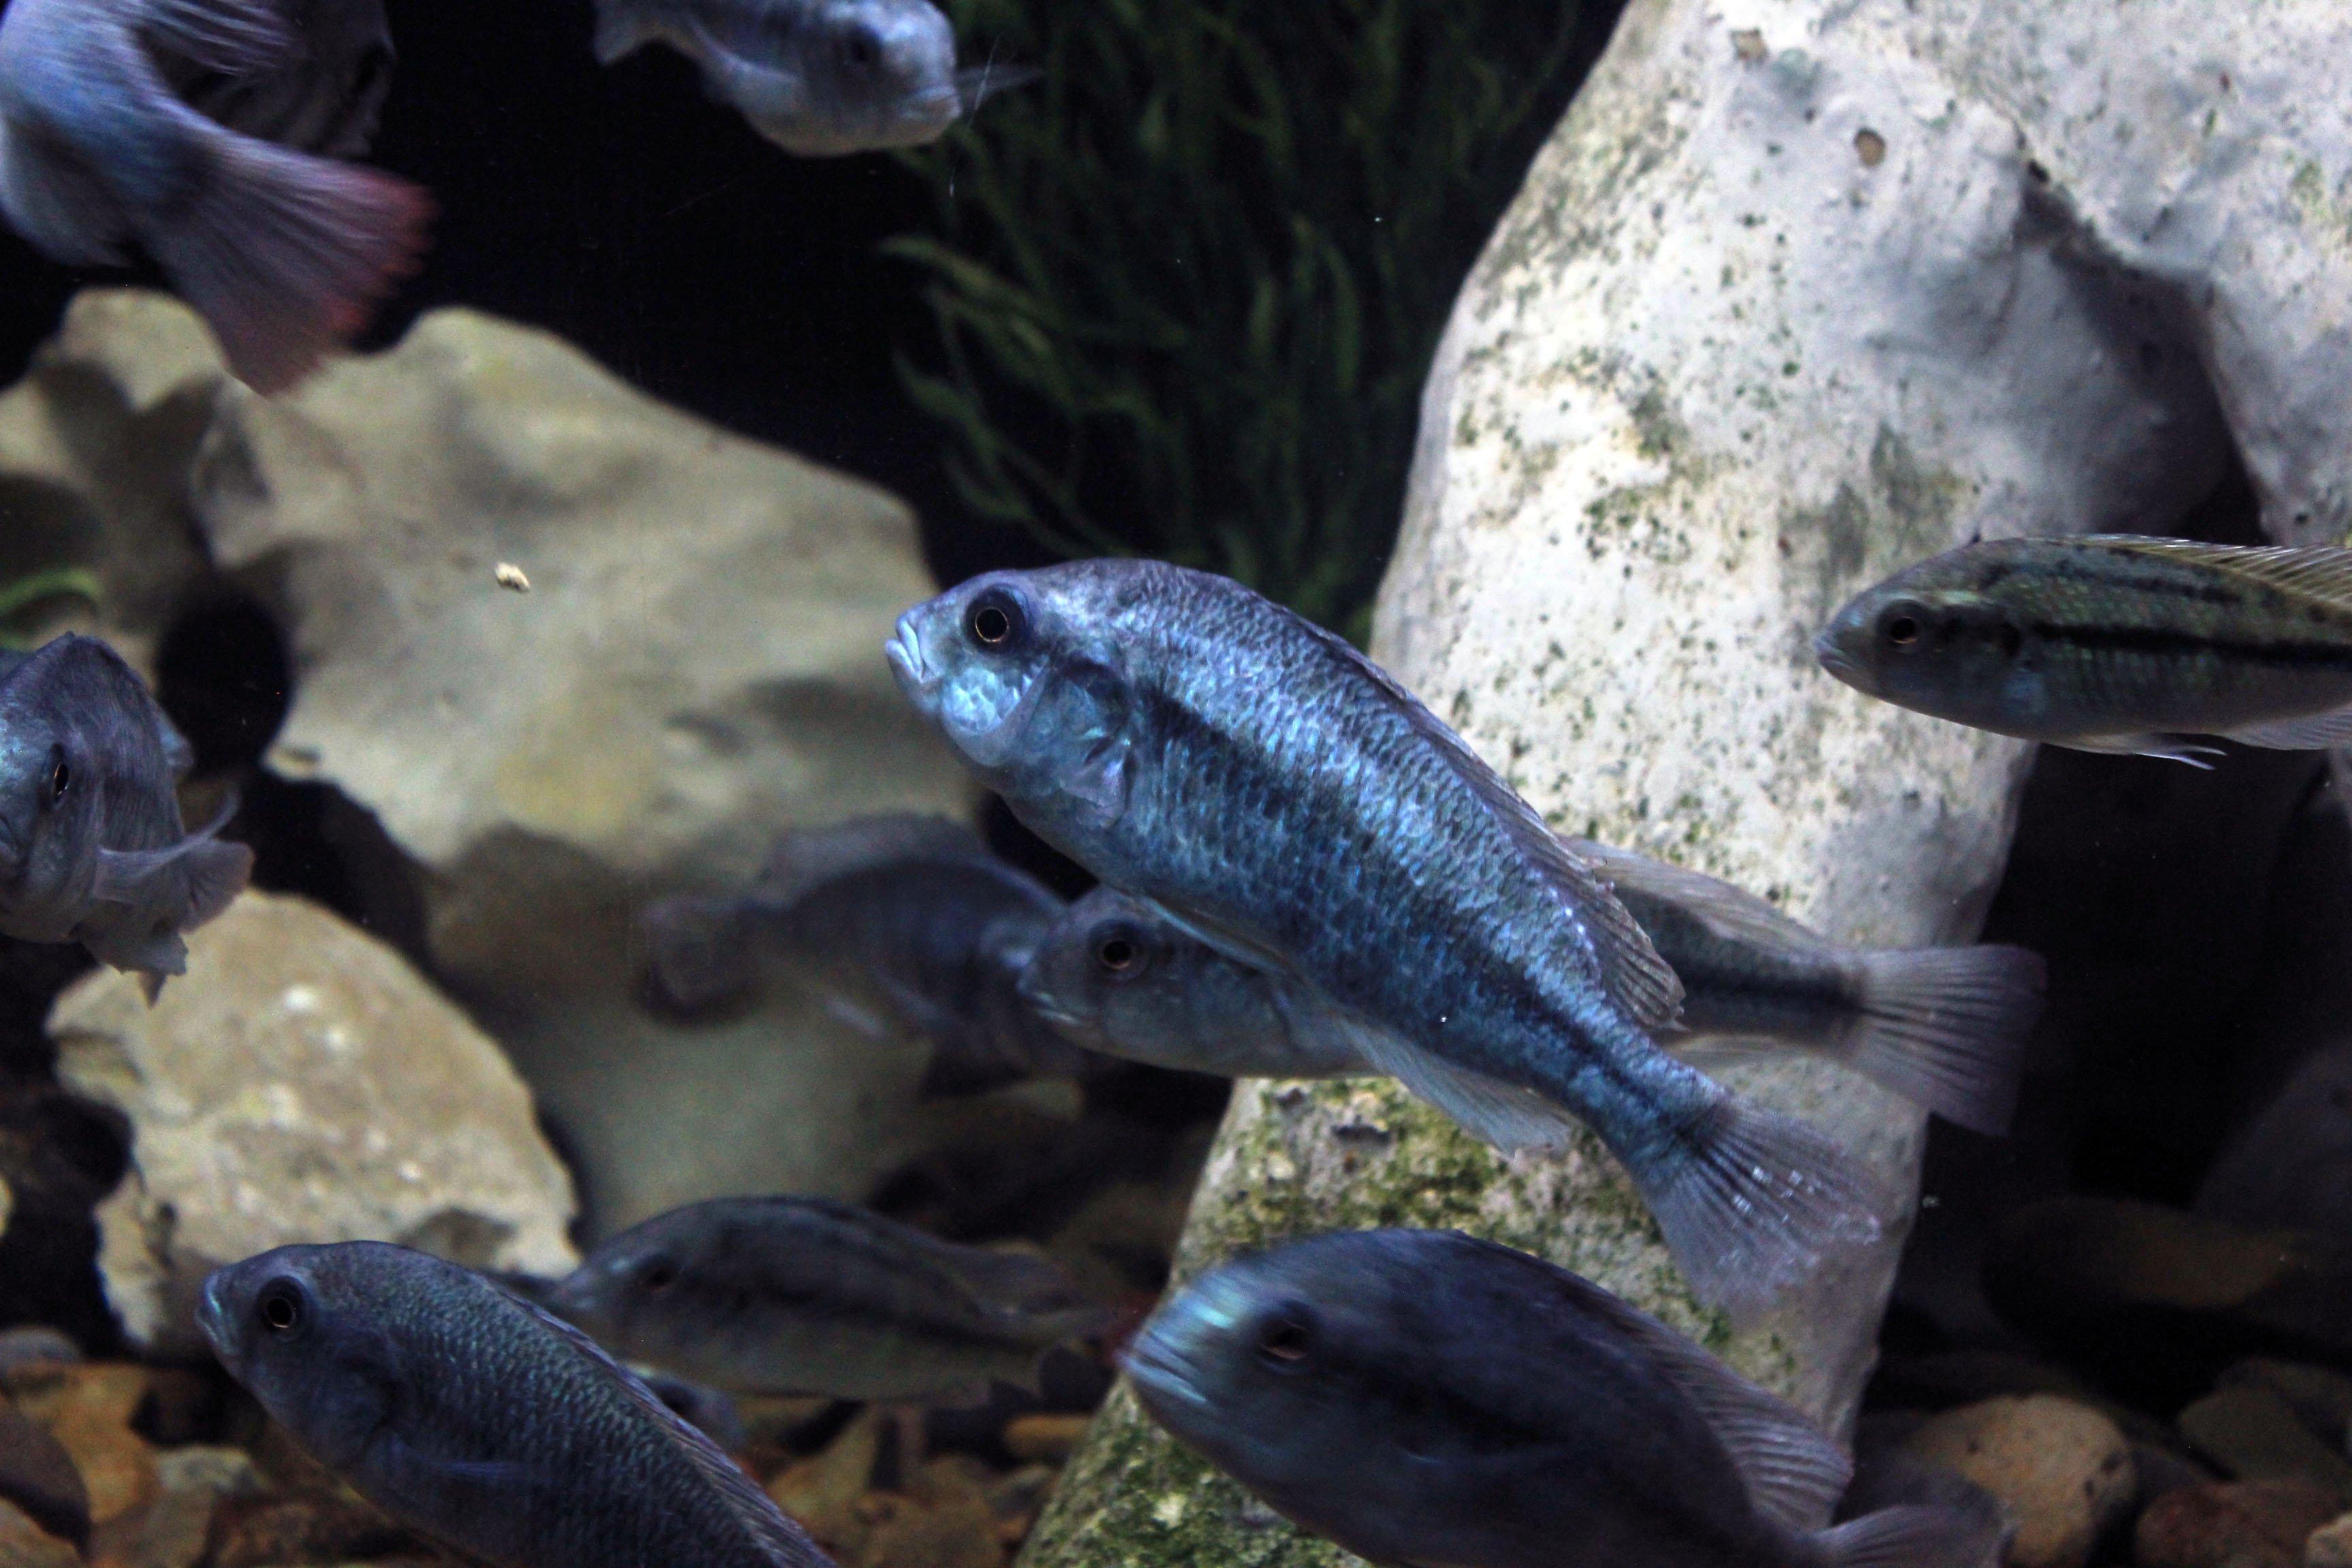 A Degeni cichlid among the rocks (Haplochromis degeni)